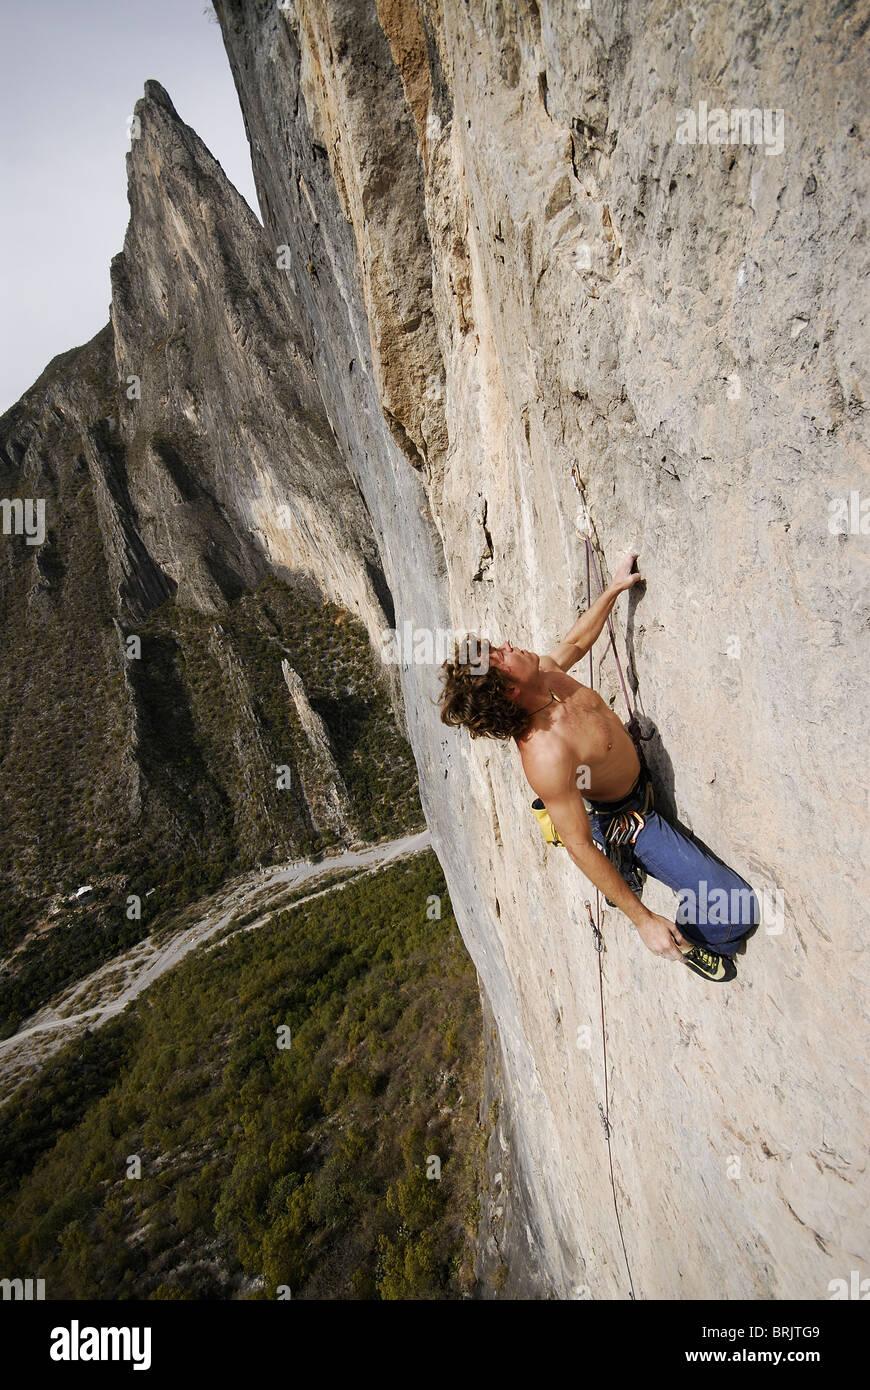 A rock climber ascends a steep rock face in Mexico. Stock Photo